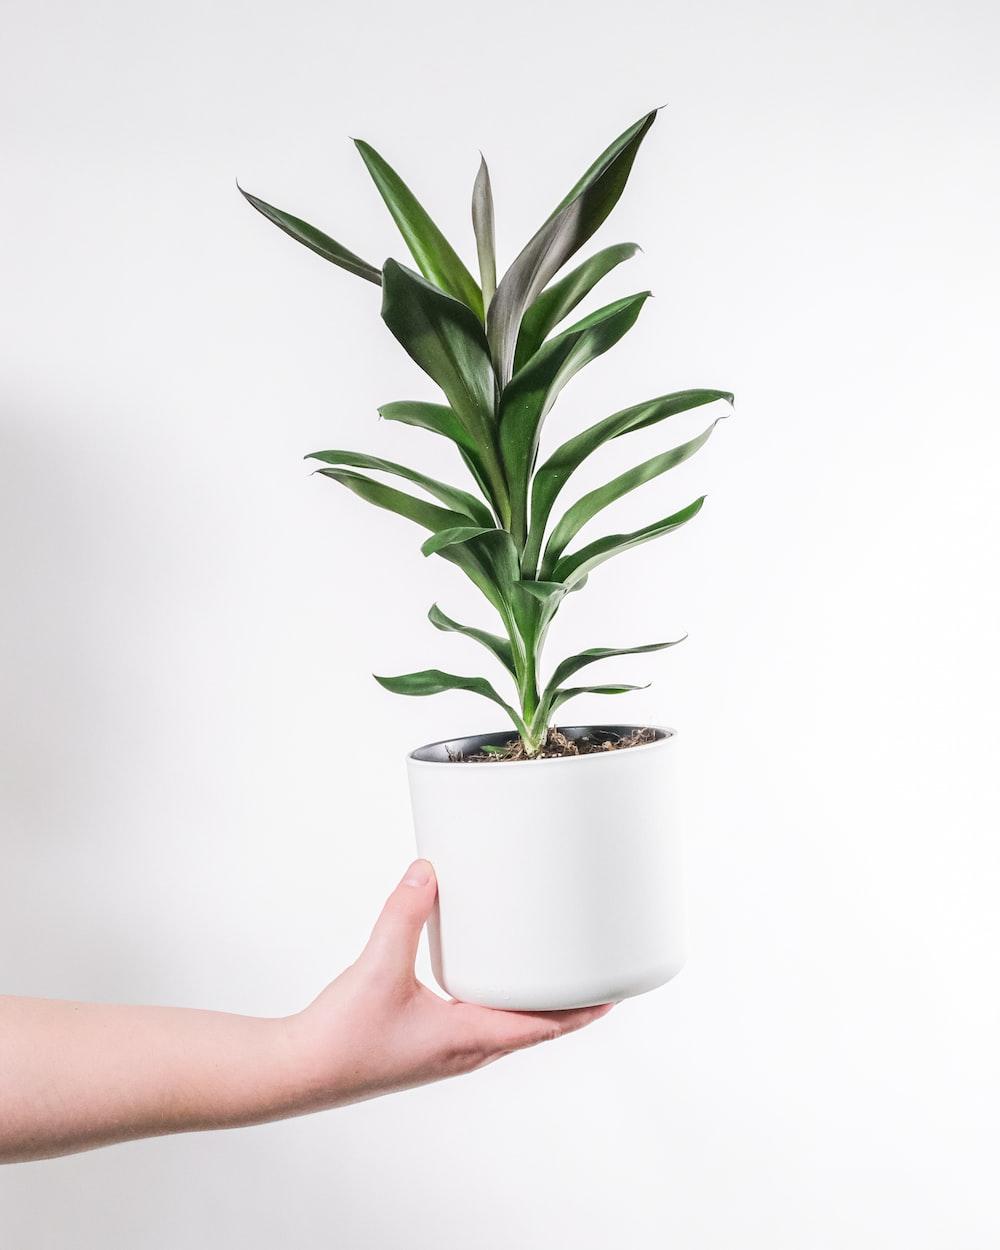 person holding green plant on white ceramic pot